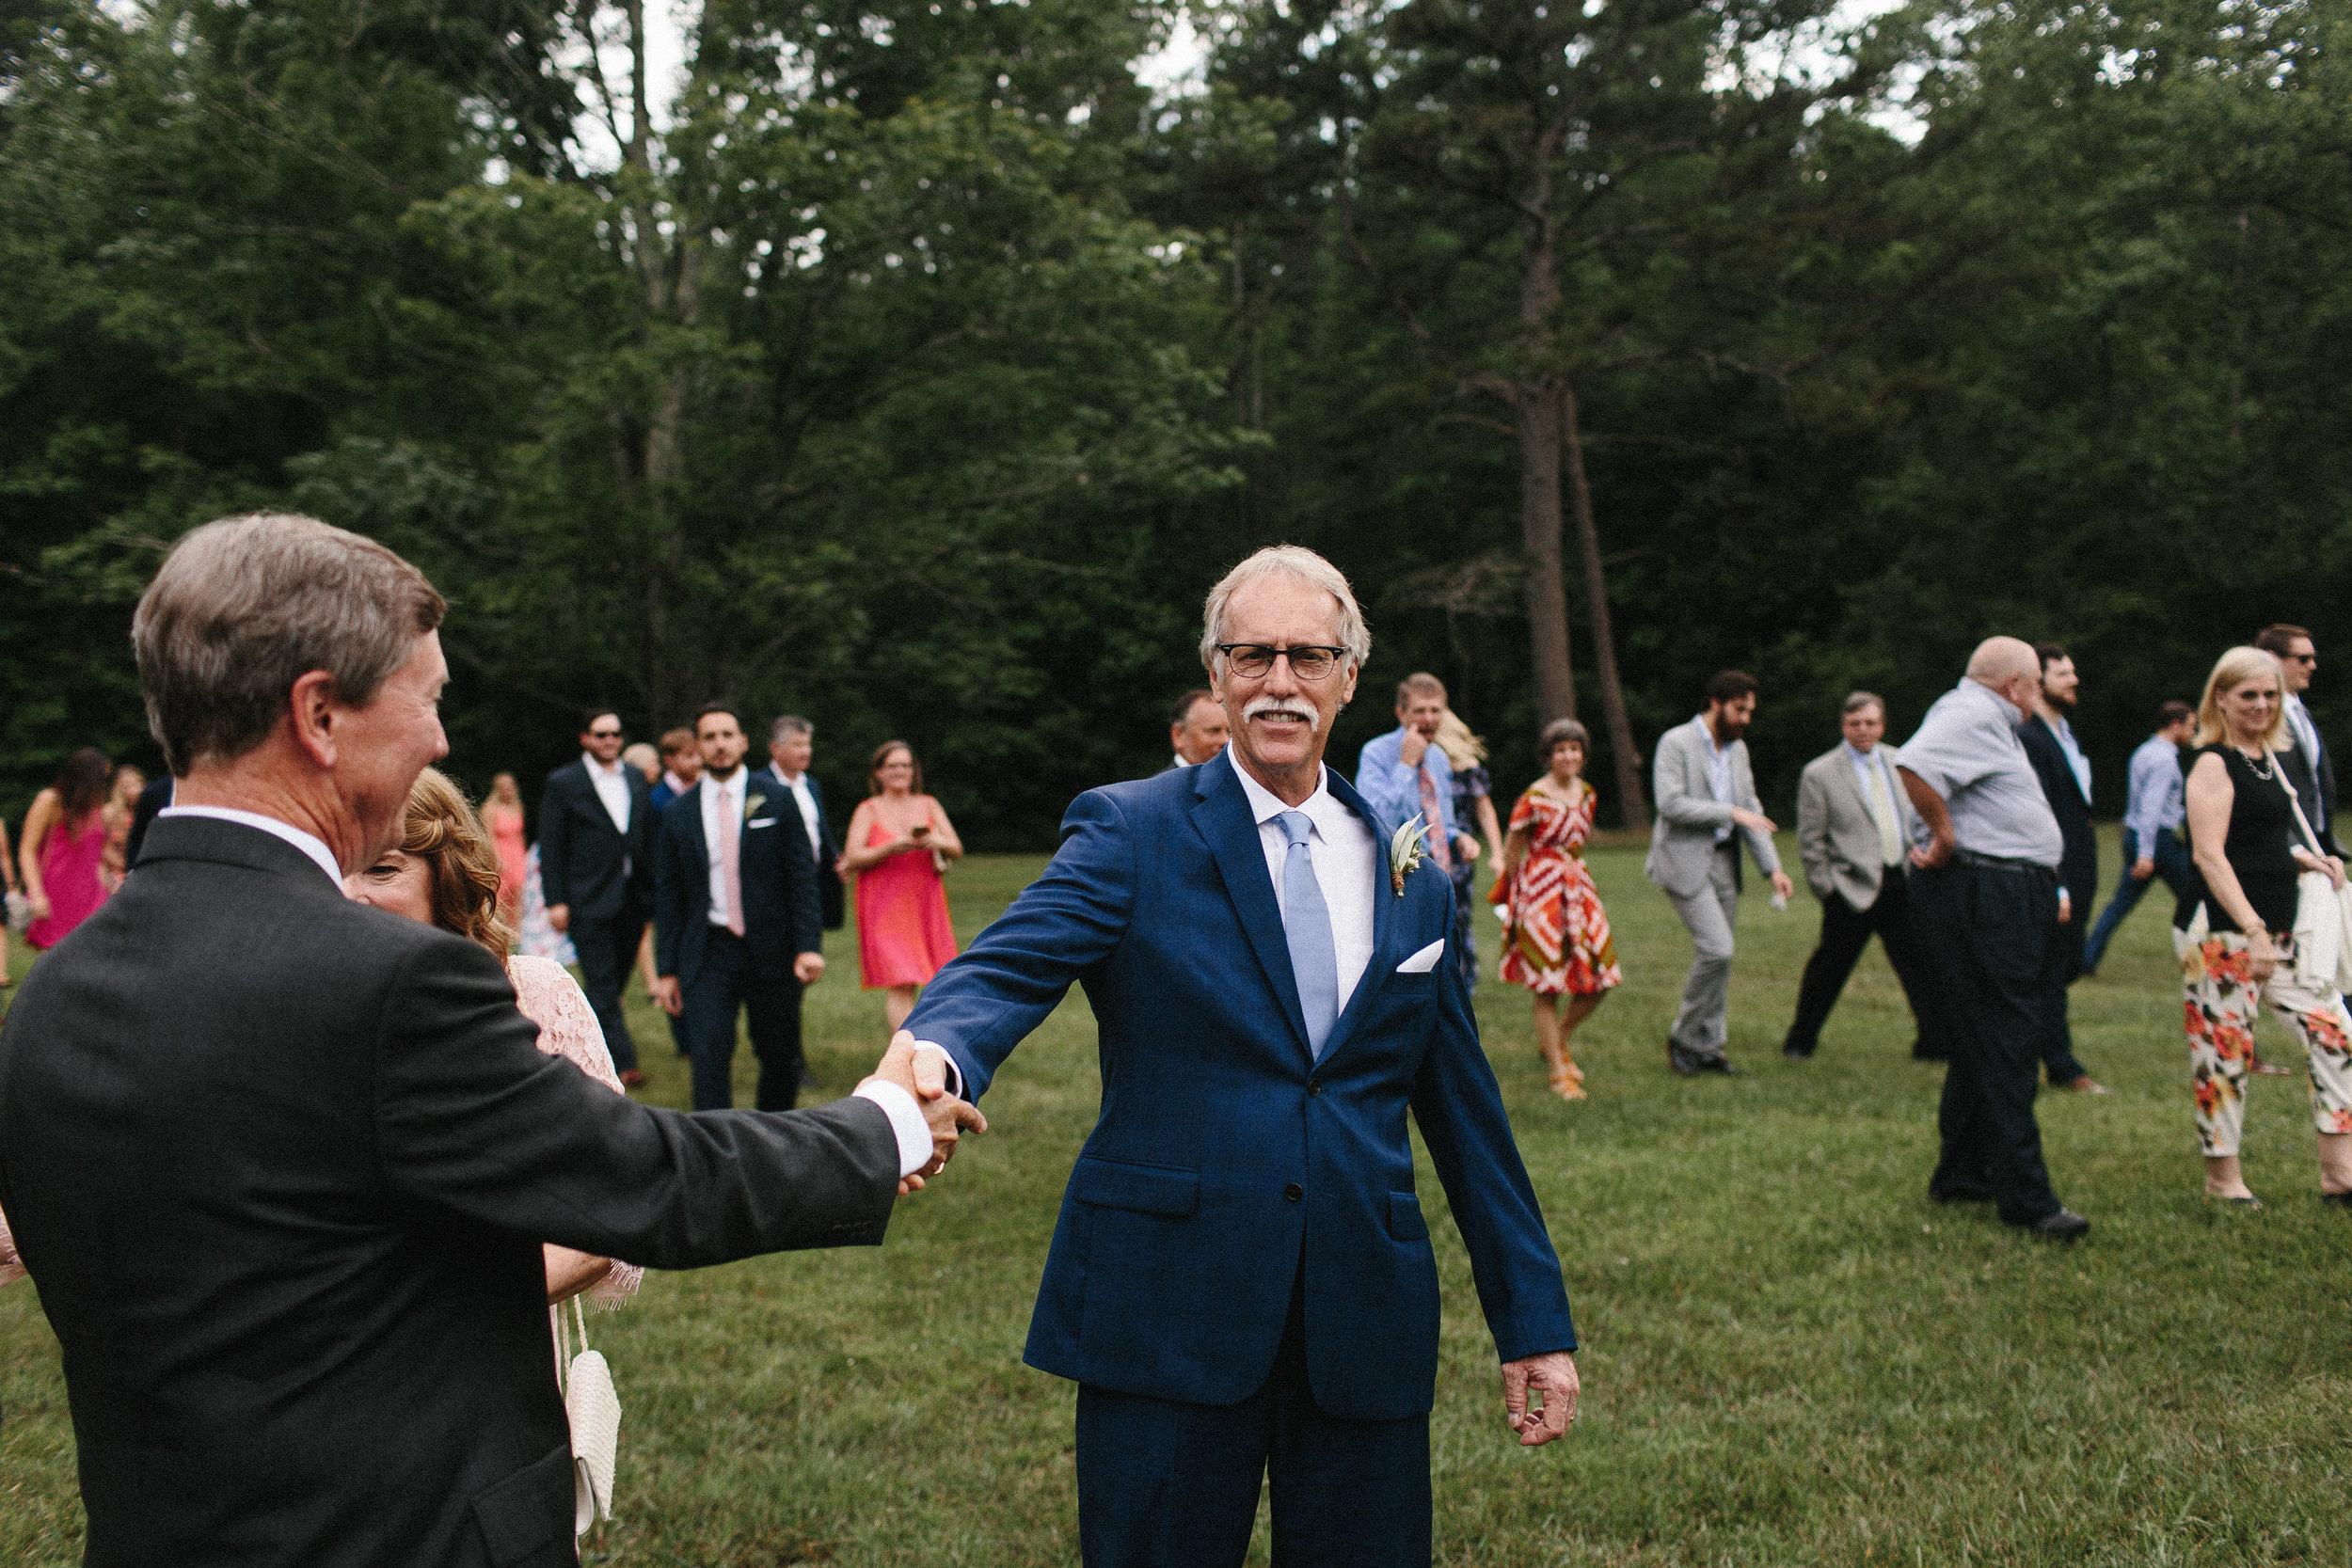 glen_ella_meadow_creekside_atlanta_wedding_photographers_1794.jpg